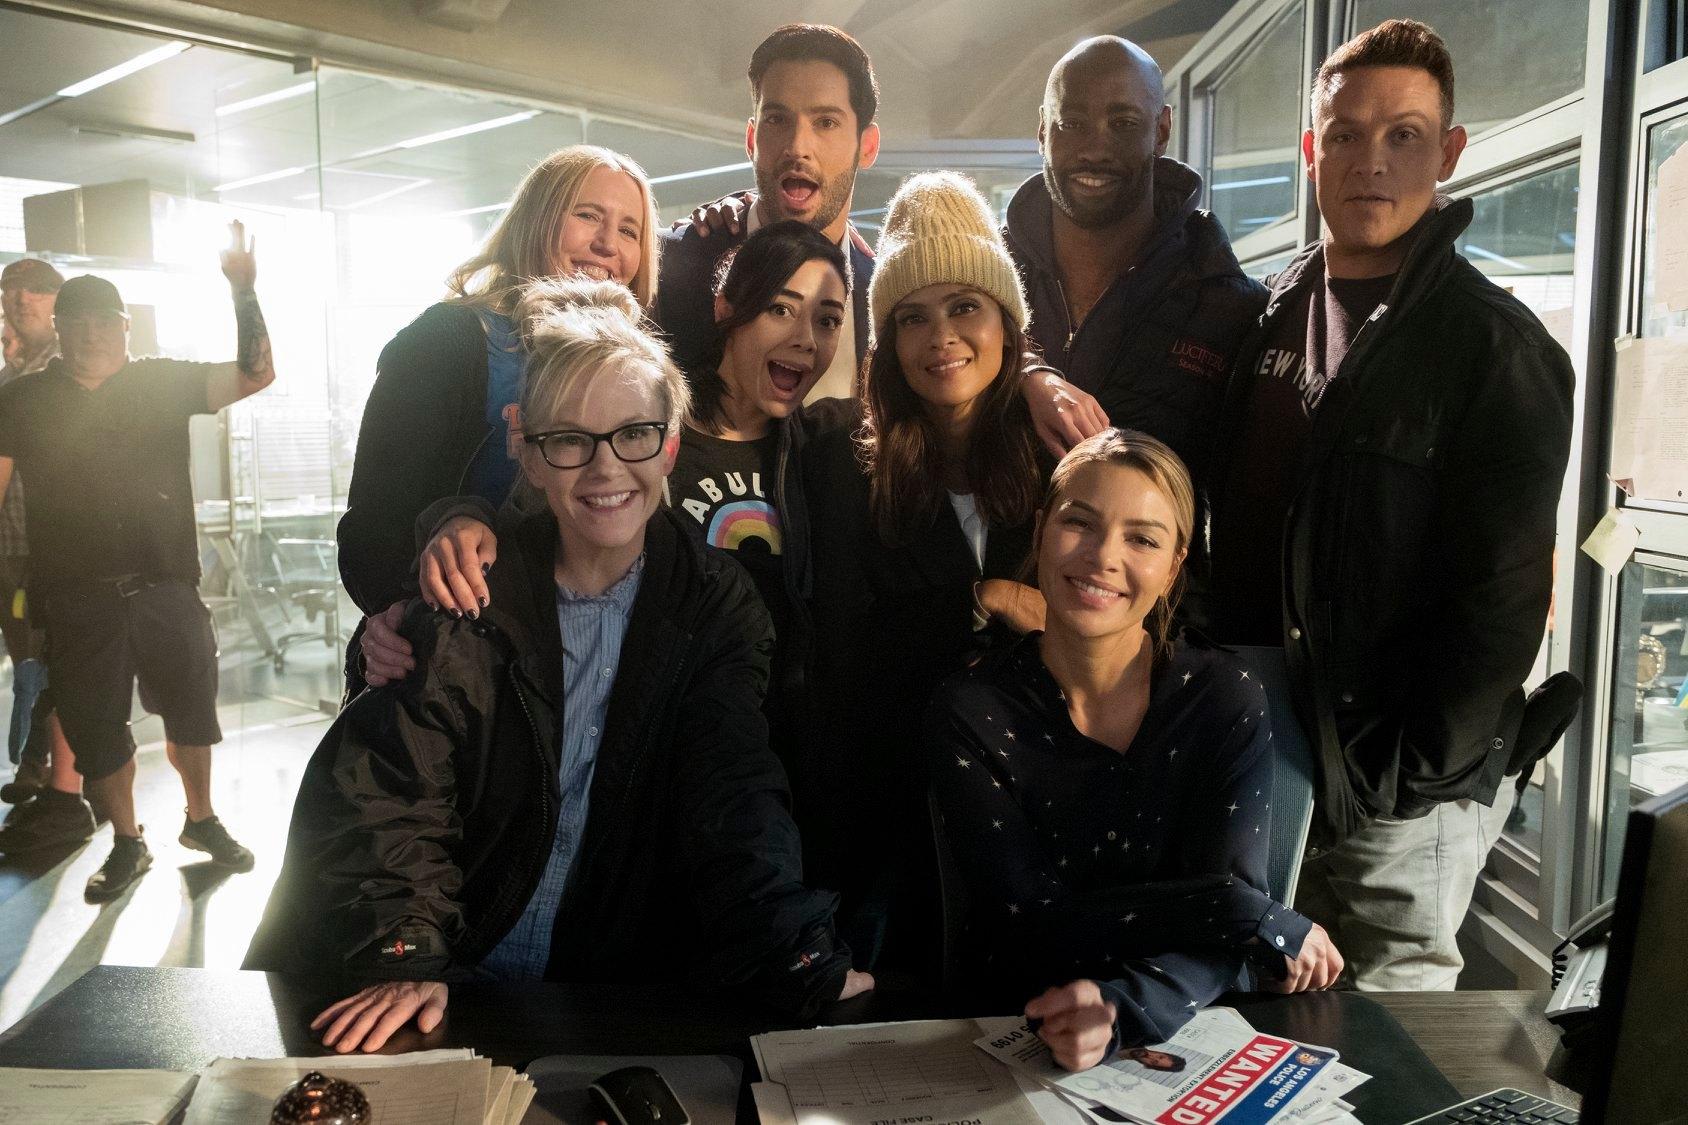 'Lucifer' Season 5 Final Episode Count Revealed